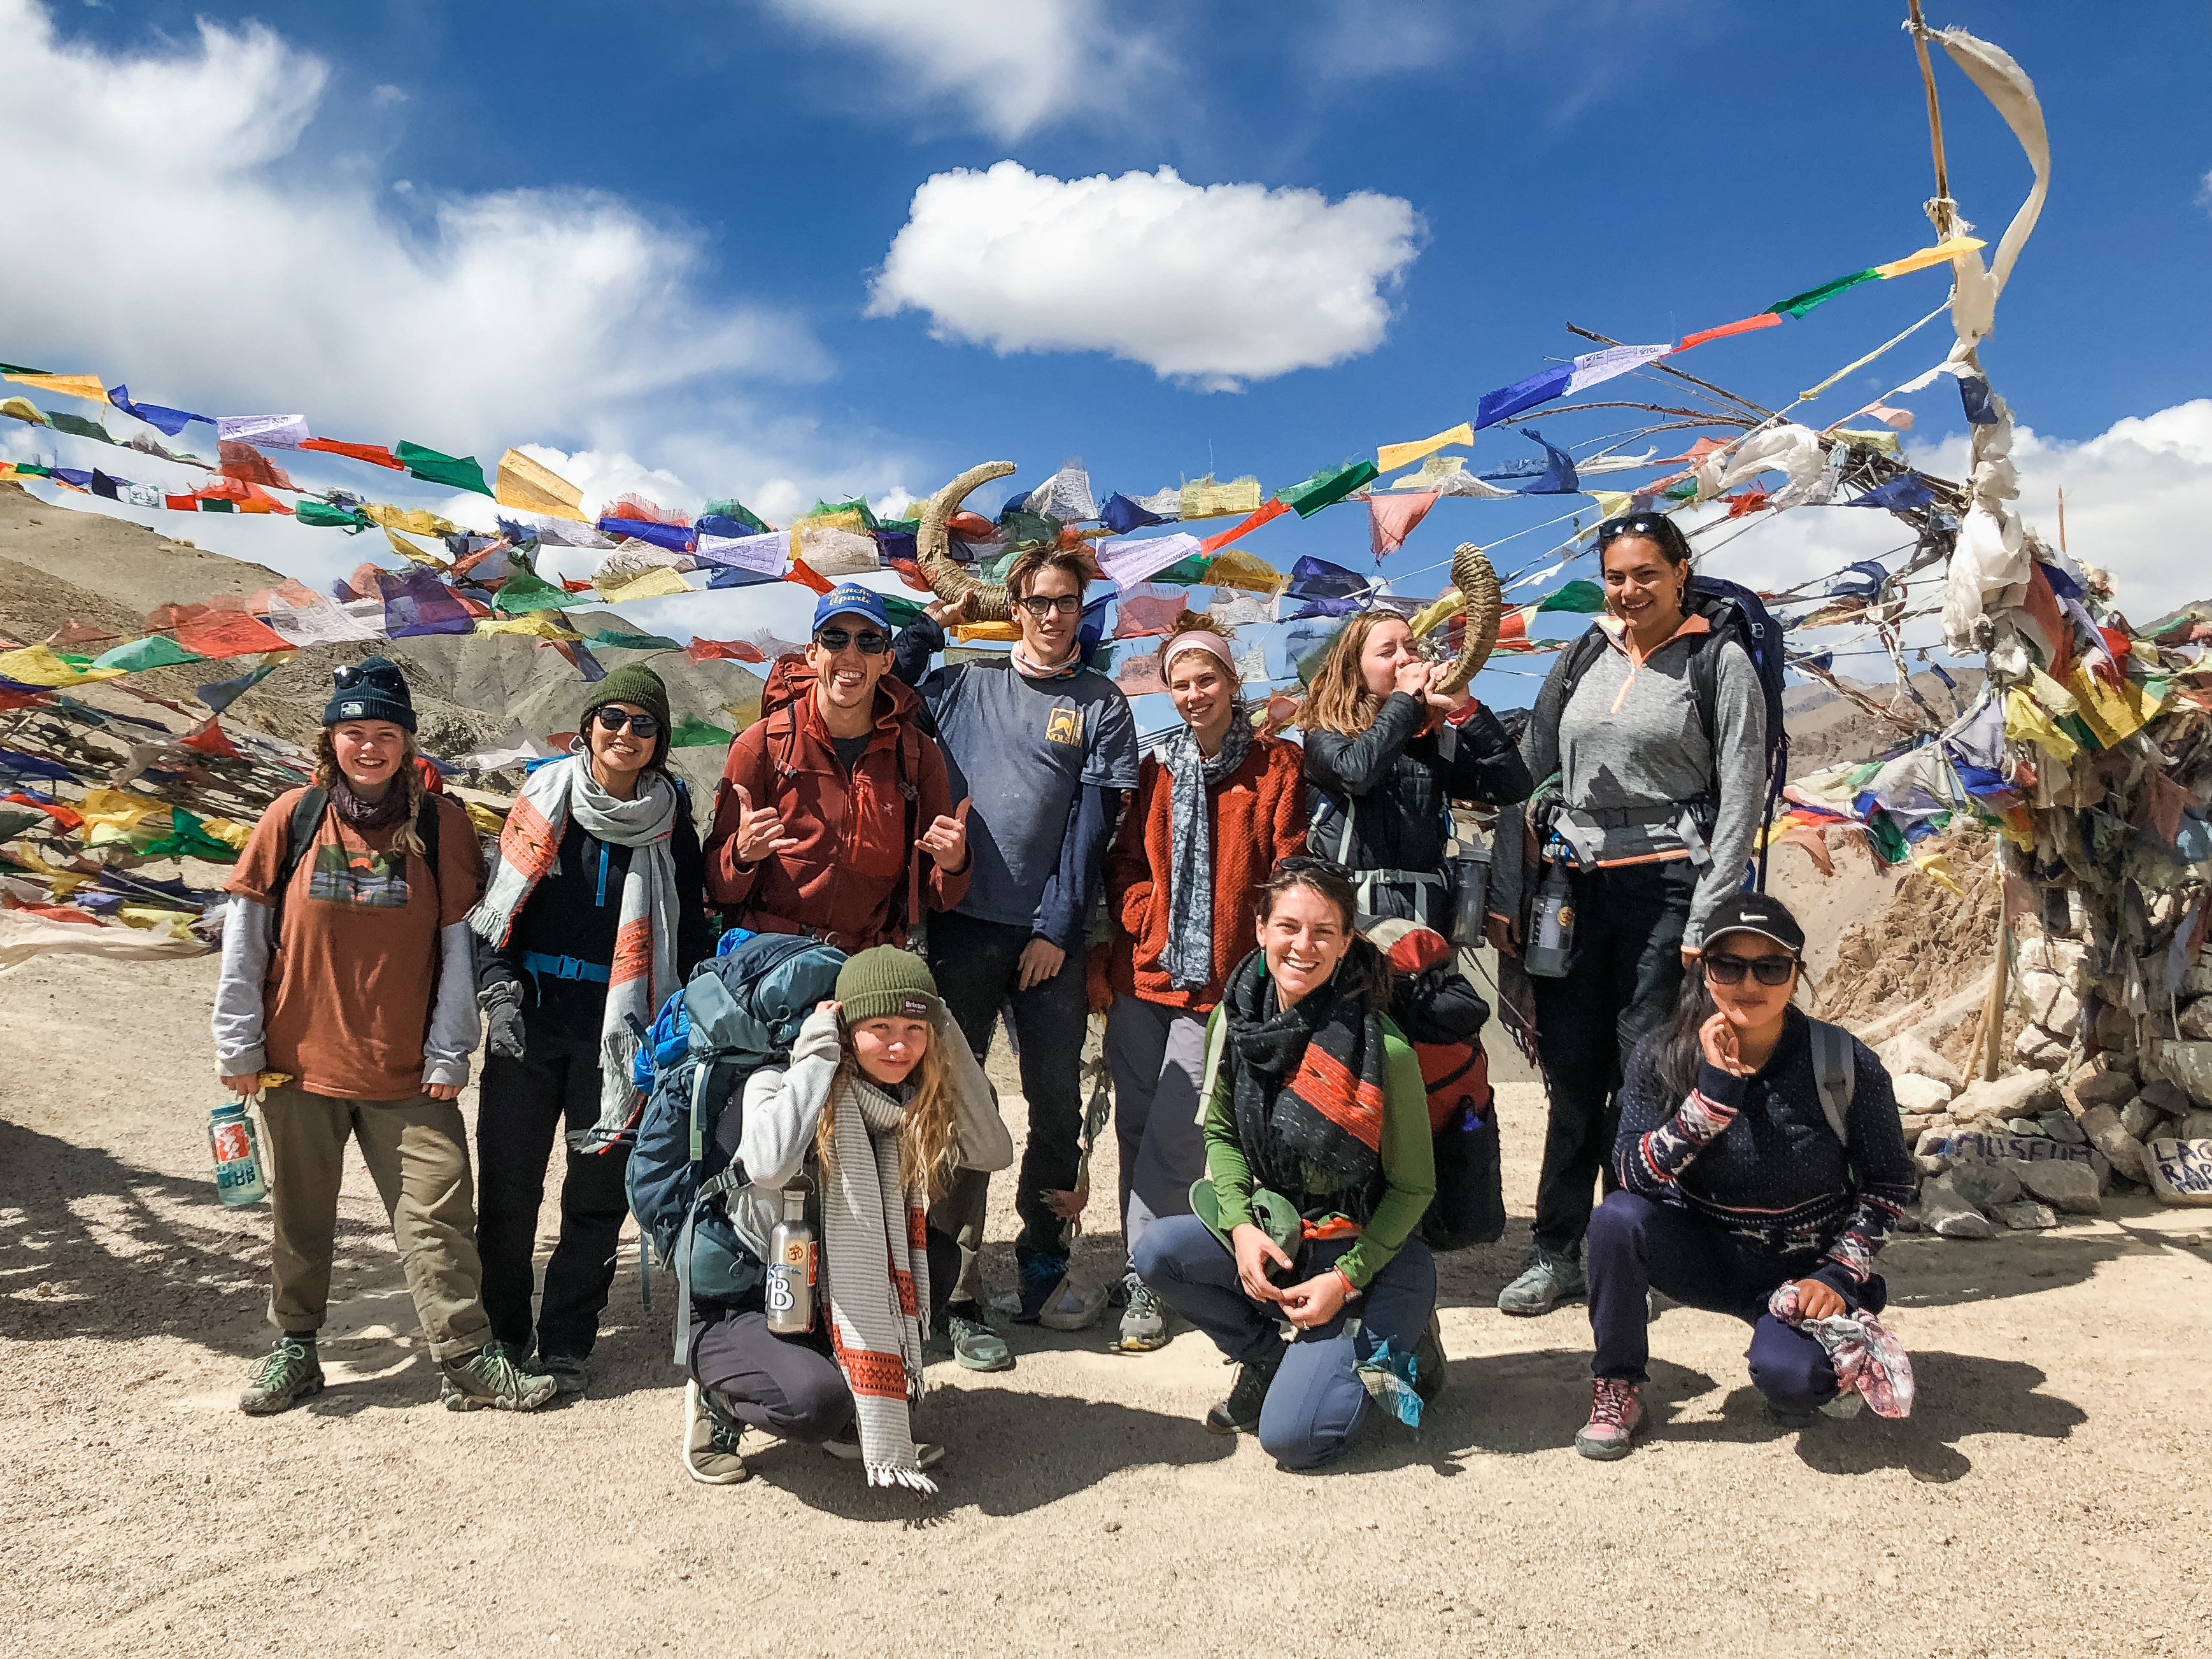 Gap Year Program - Carpe Diem Education | India Semester: Spirituality & Climate Change  5